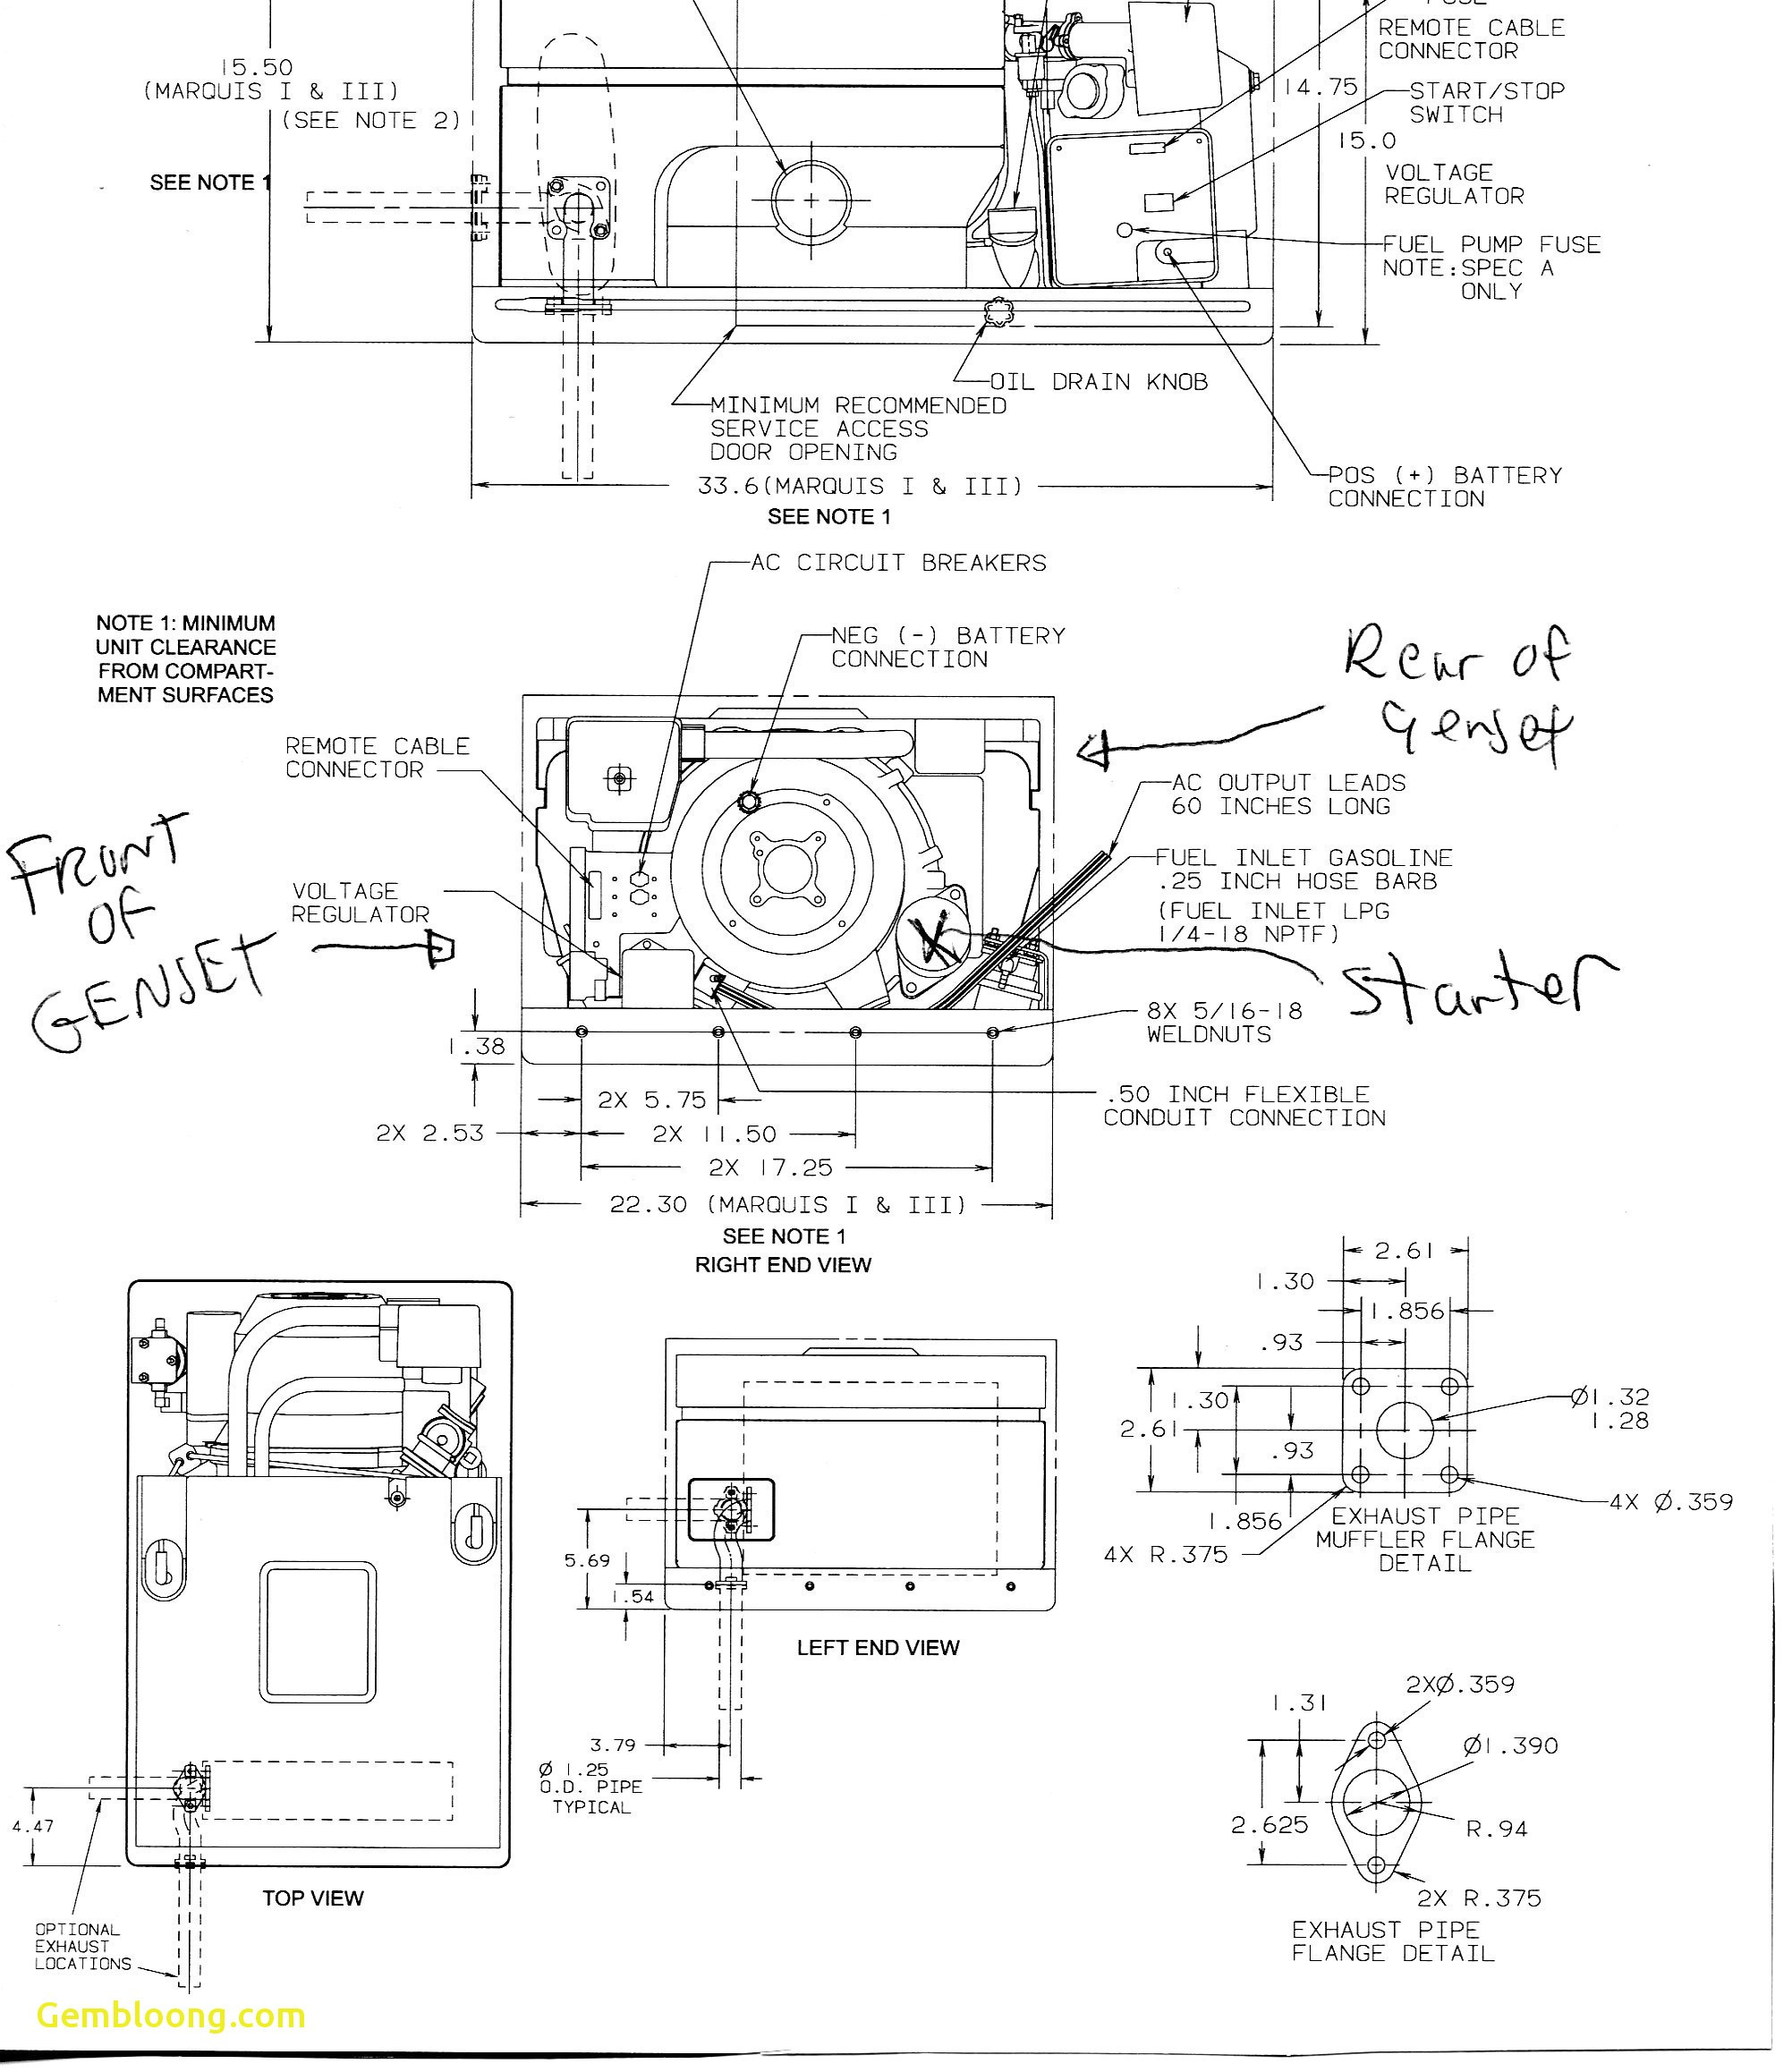 6.5 Onan Generator Wiring Diagram from mainetreasurechest.com